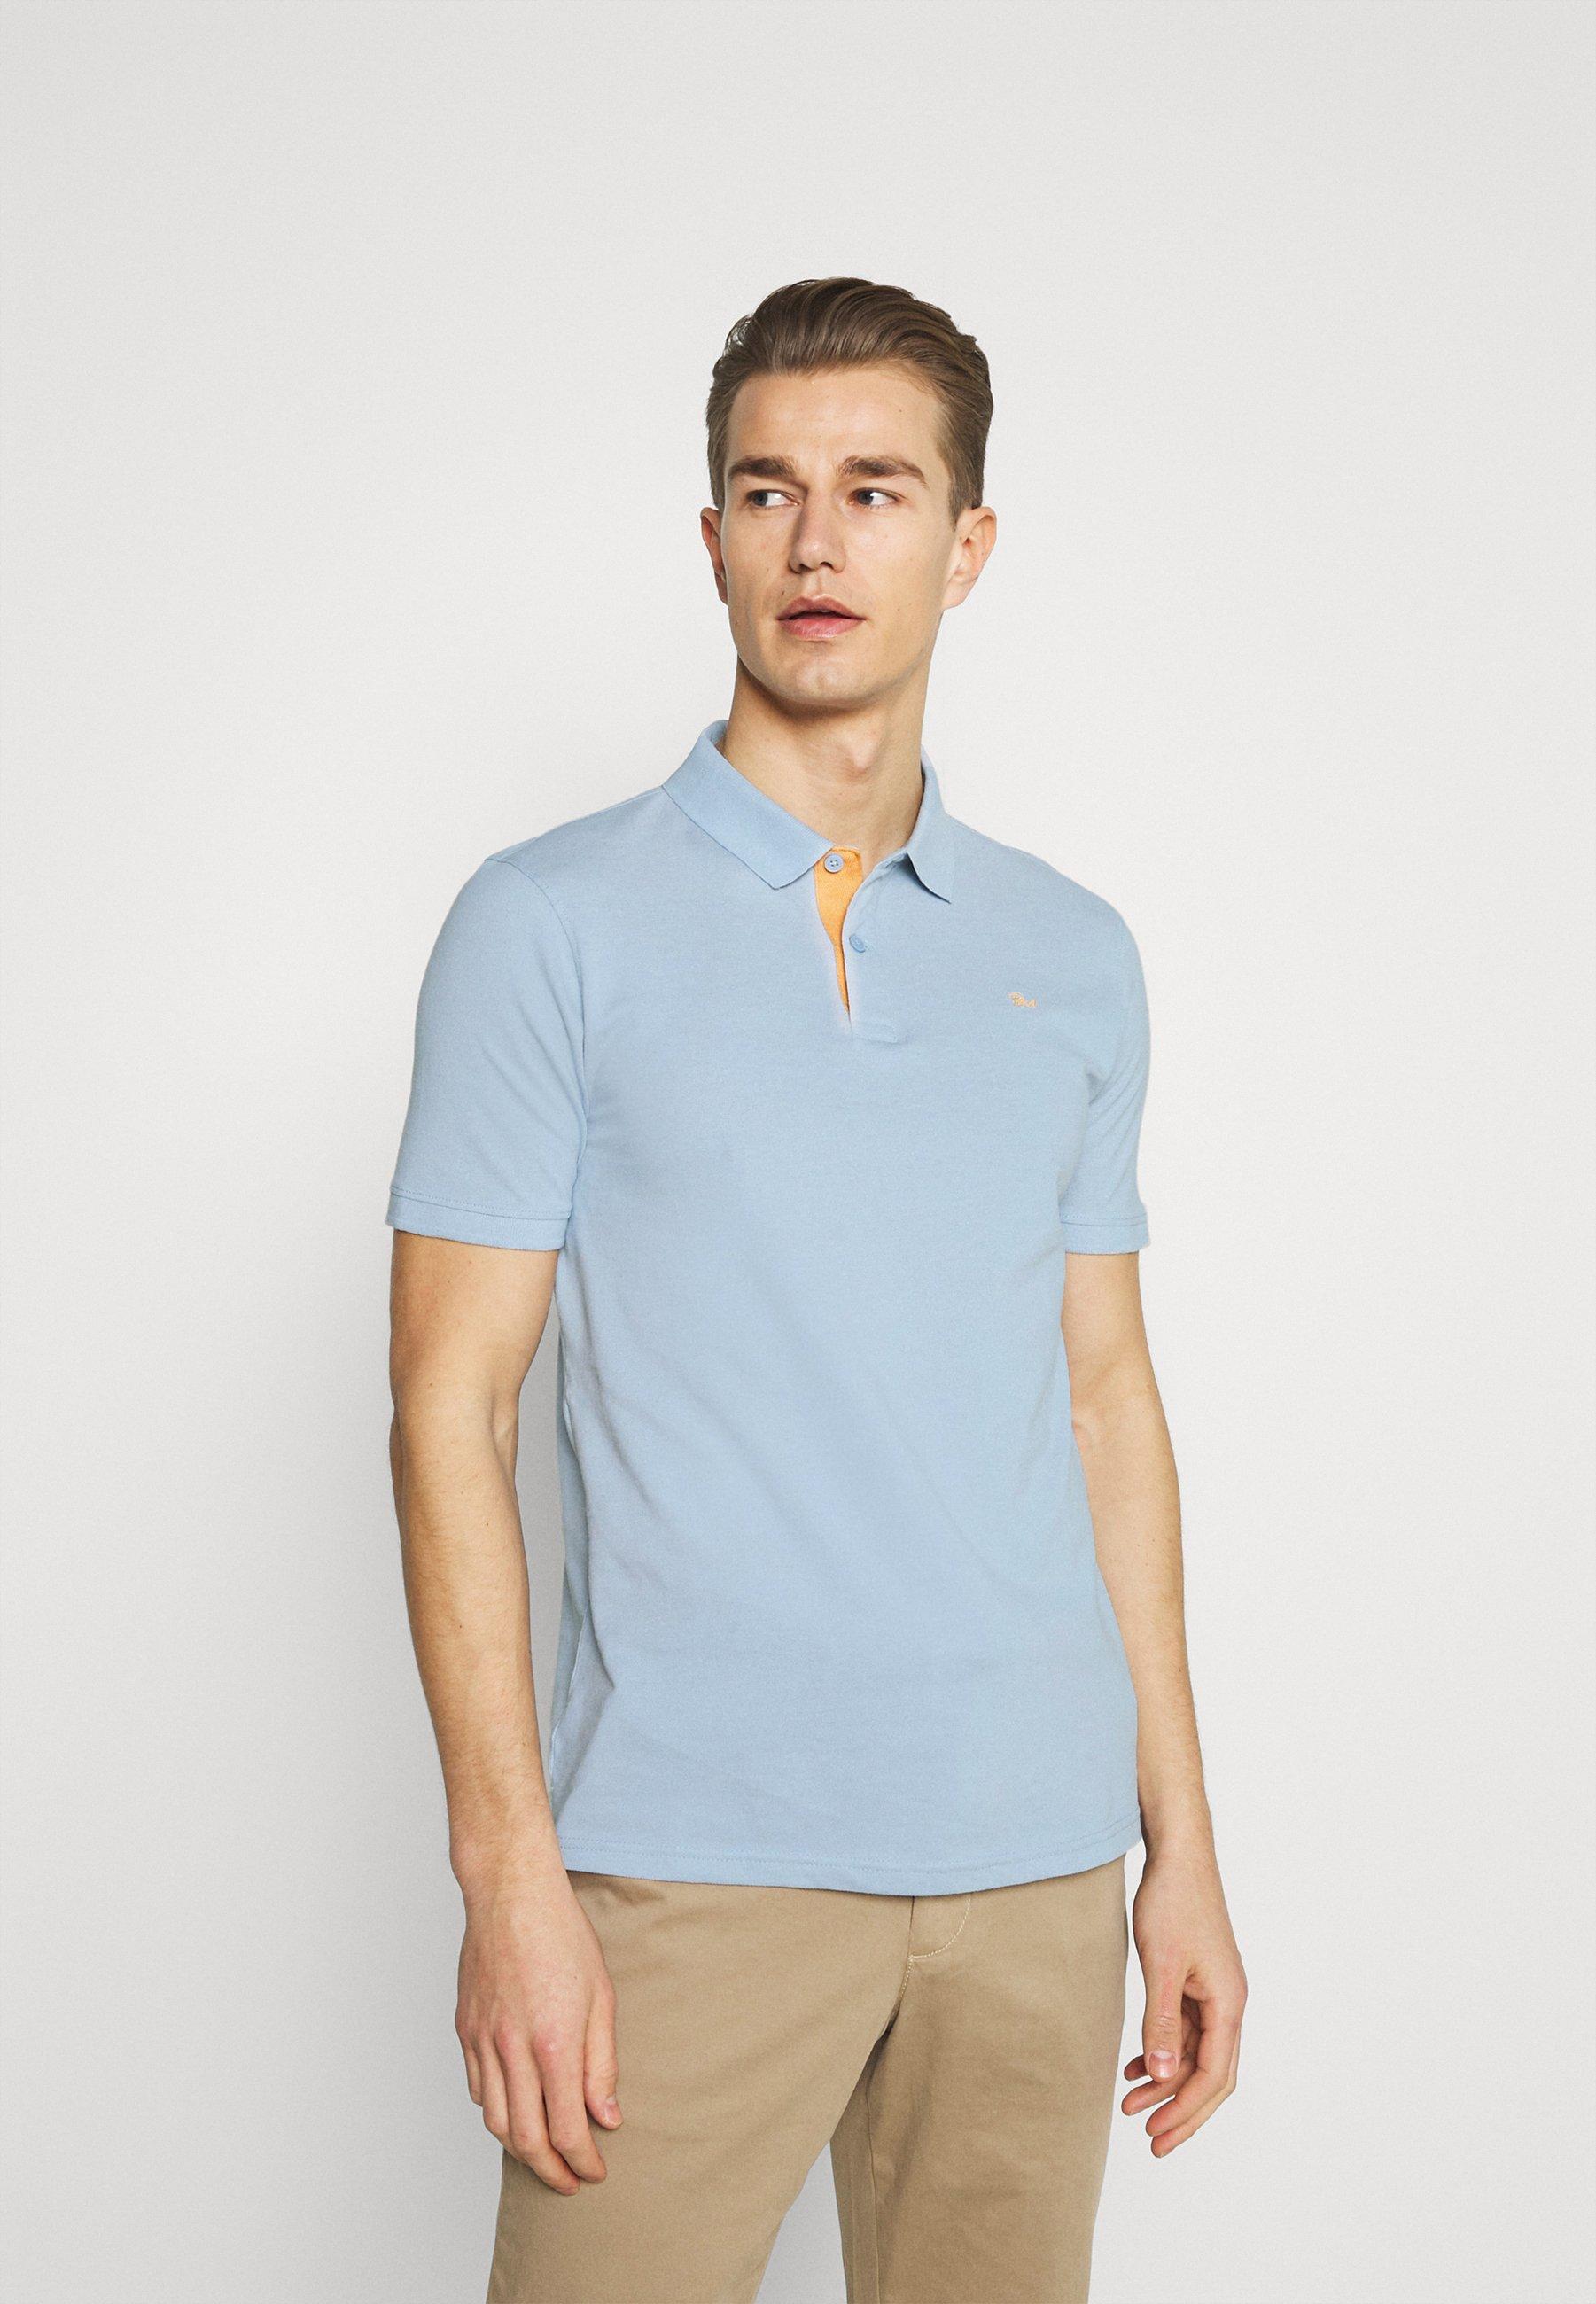 Men Polo shirt - tanagerturkise